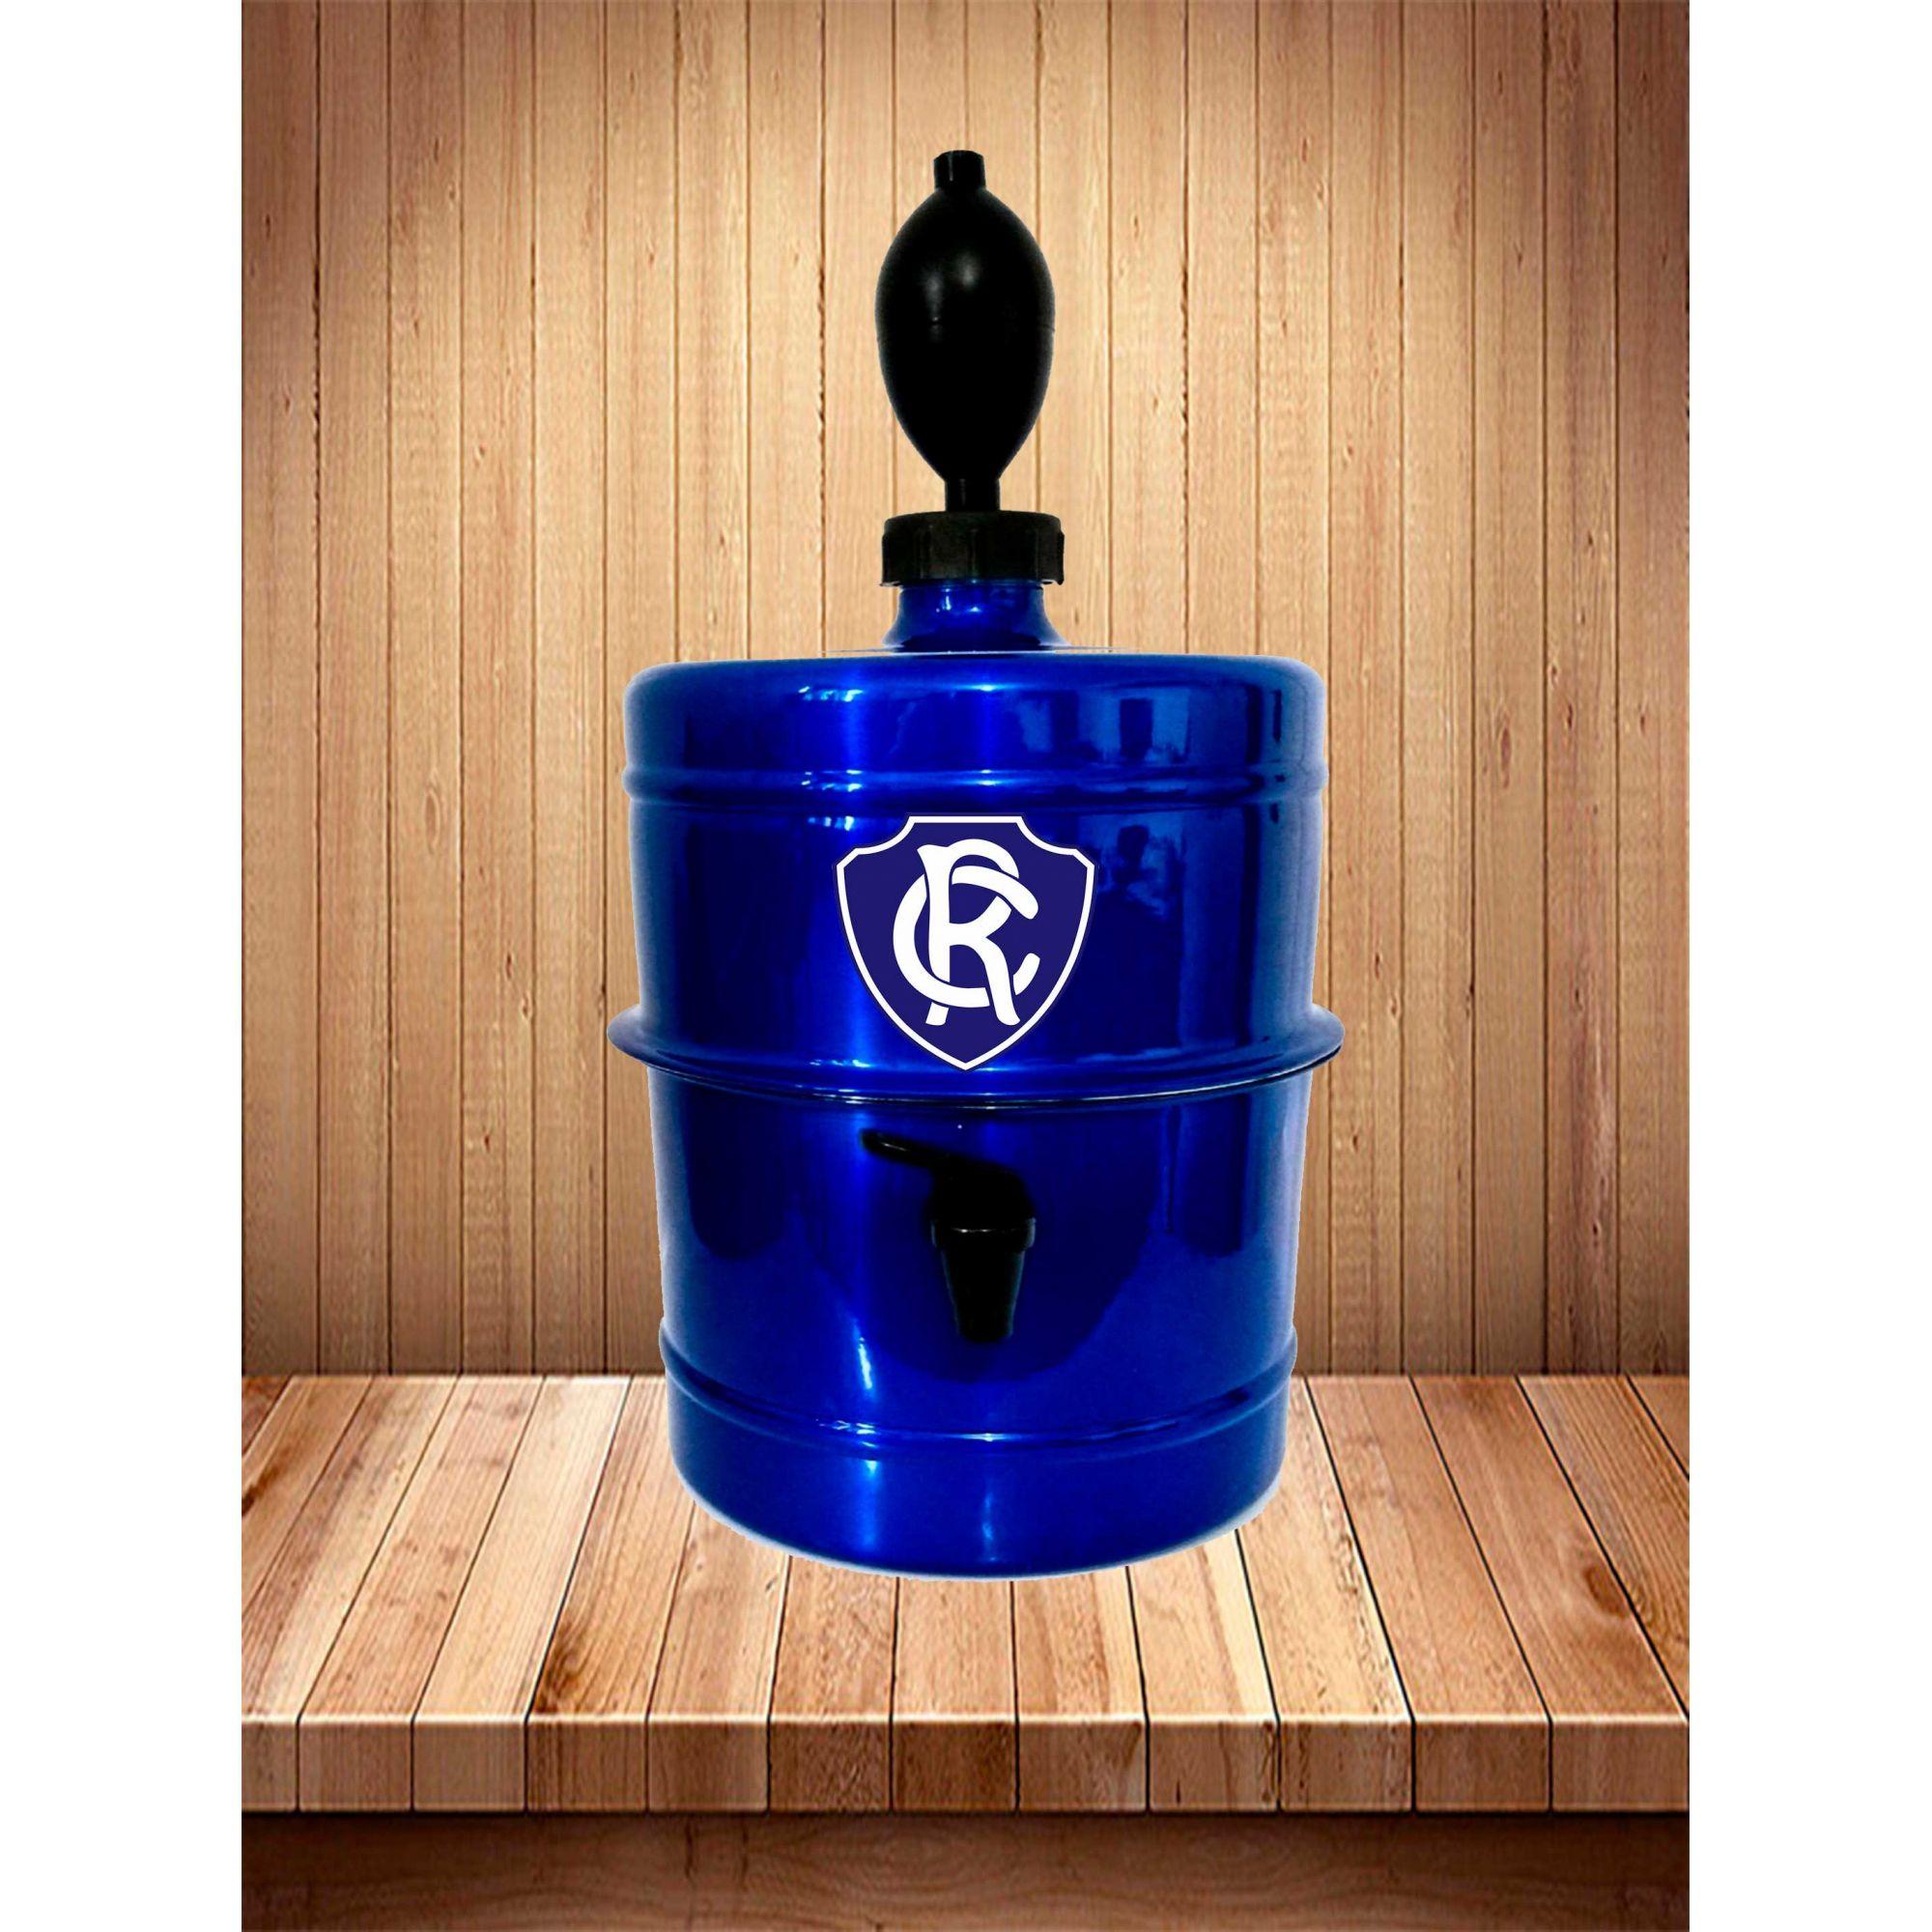 Chopeira Remo - Azul - Portátil 5,1 L